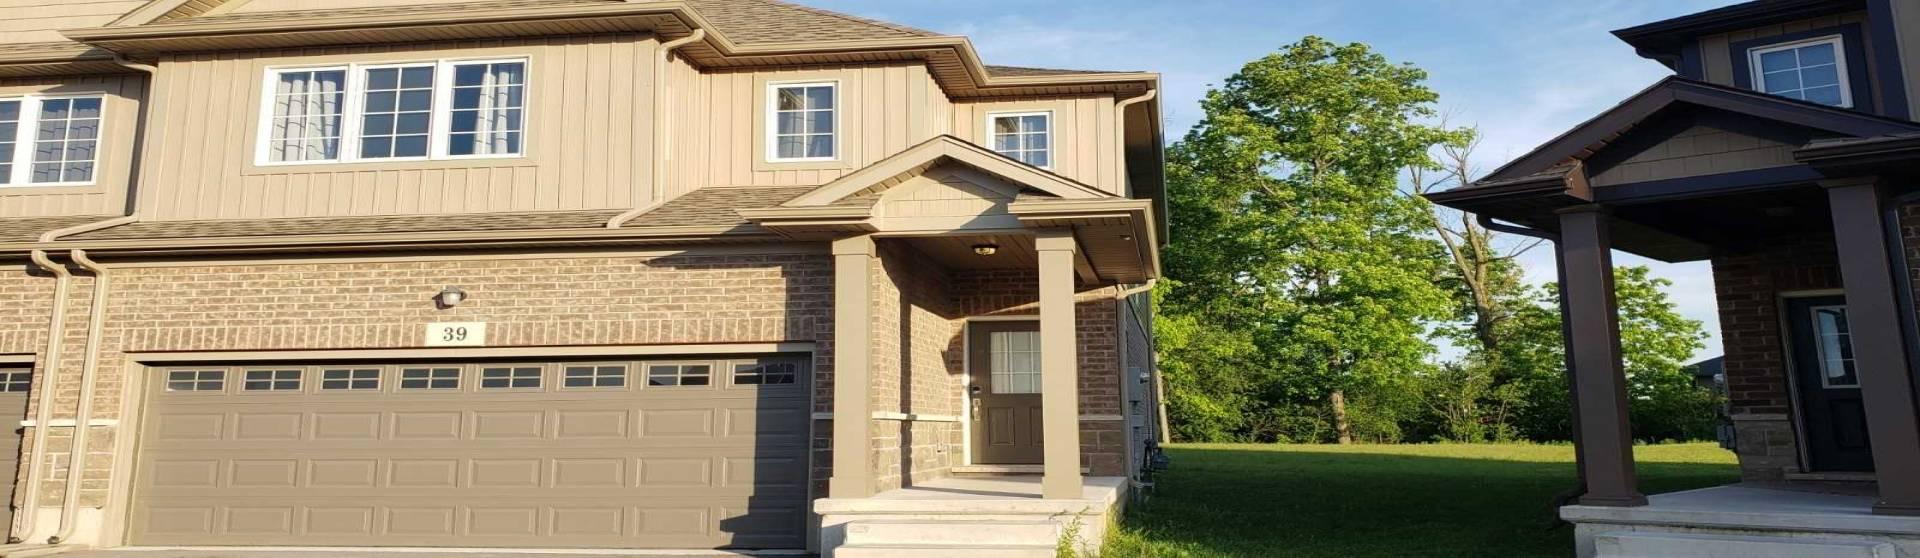 39 Elderberry Rd- Thorold- Ontario L2V0E7, 4 Bedrooms Bedrooms, 9 Rooms Rooms,4 BathroomsBathrooms,Semi-detached,Lease,Elderberry,X4781111